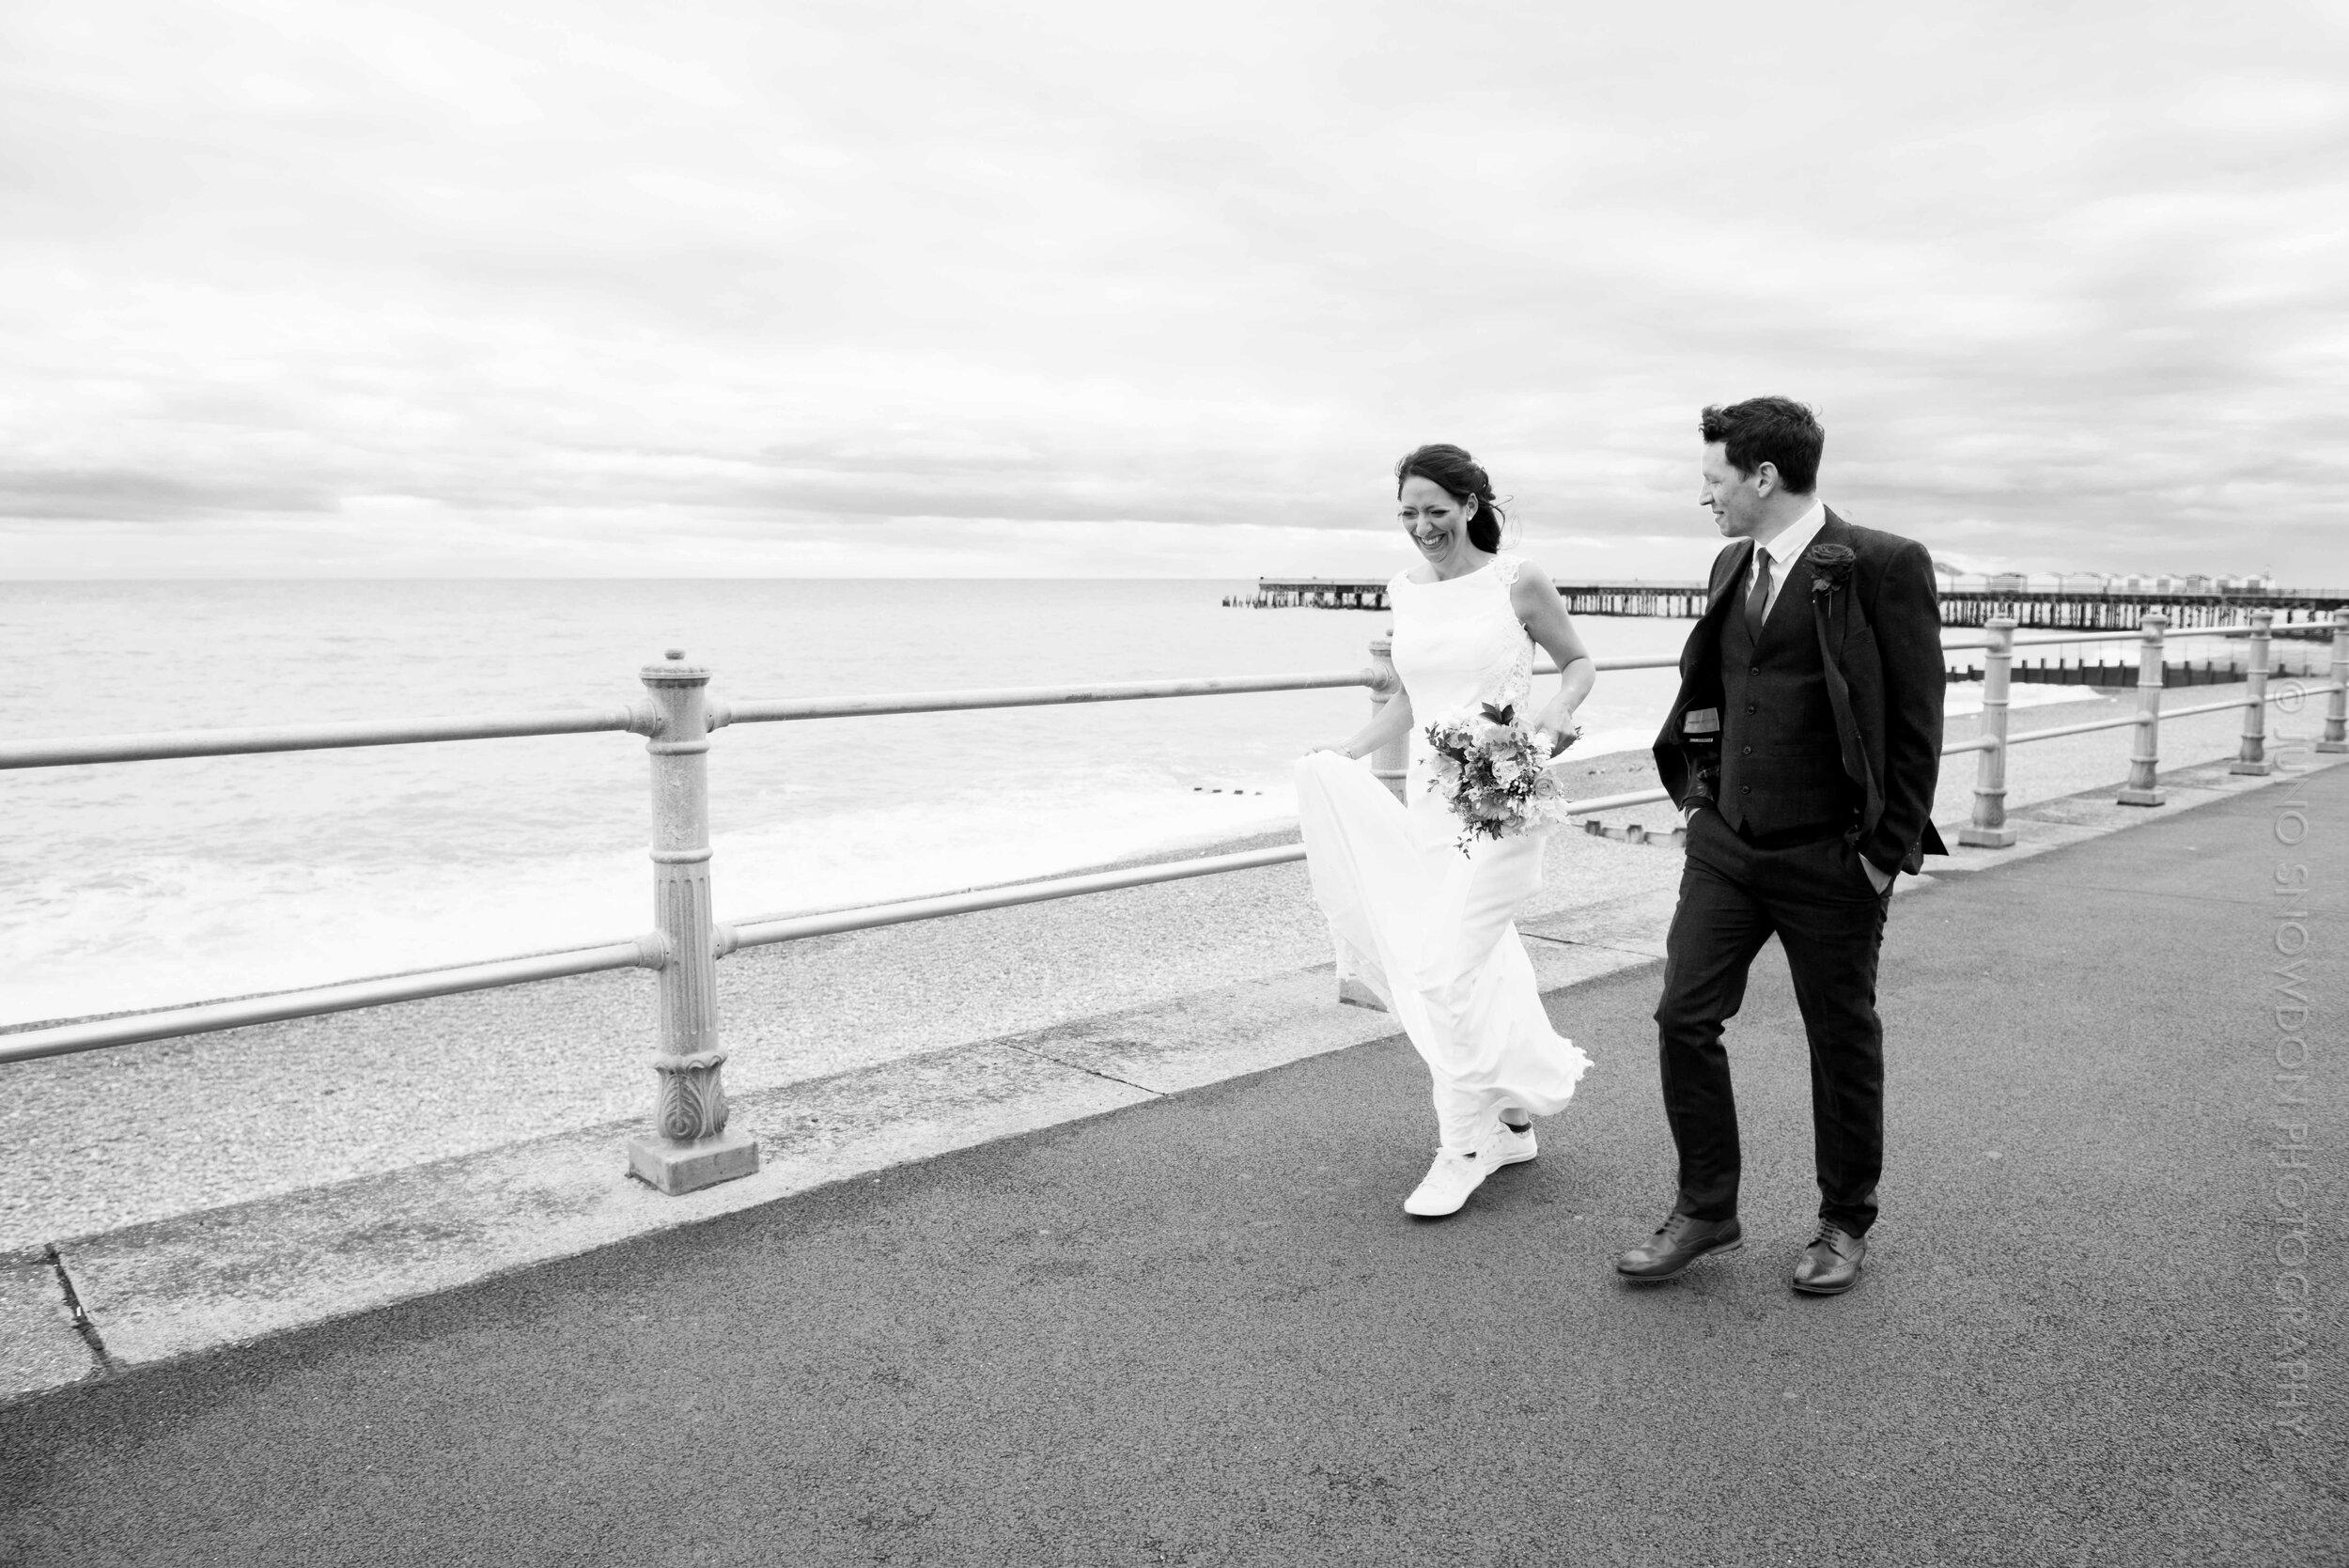 juno-snowdon-photography-wedding-7721.jpg